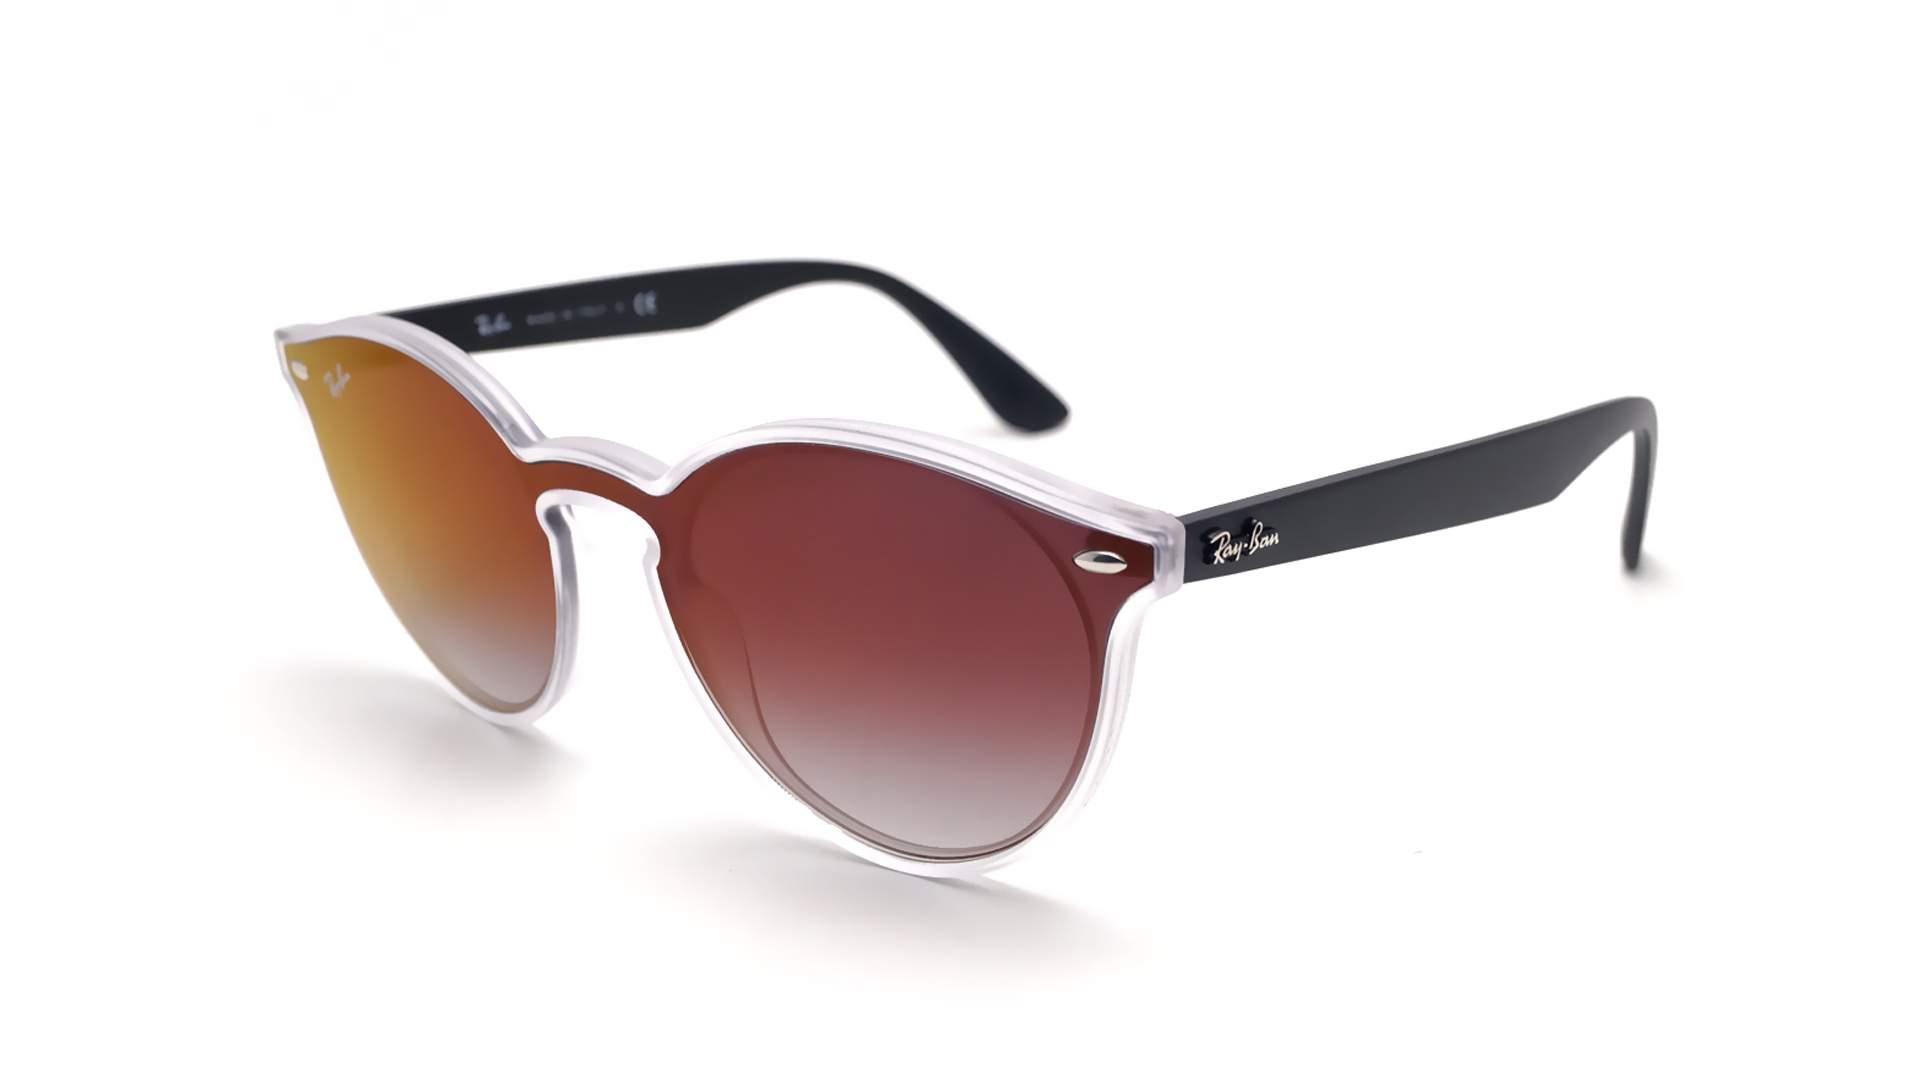 18eac6297c Sunglasses Ray-Ban Blaze RB4380N 6355 U0 37-17 Black Matte Medium Gradient  Mirror